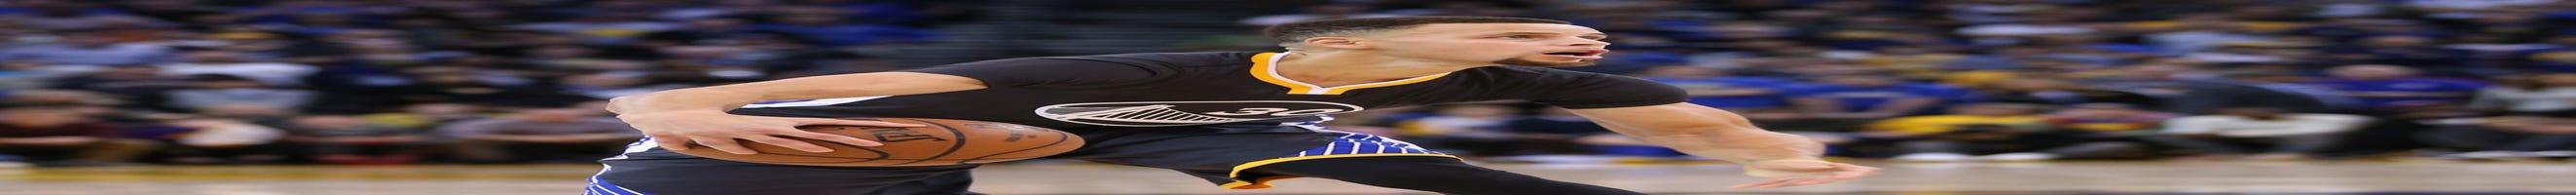 Phoenix Suns brace for record-chasing Warriors